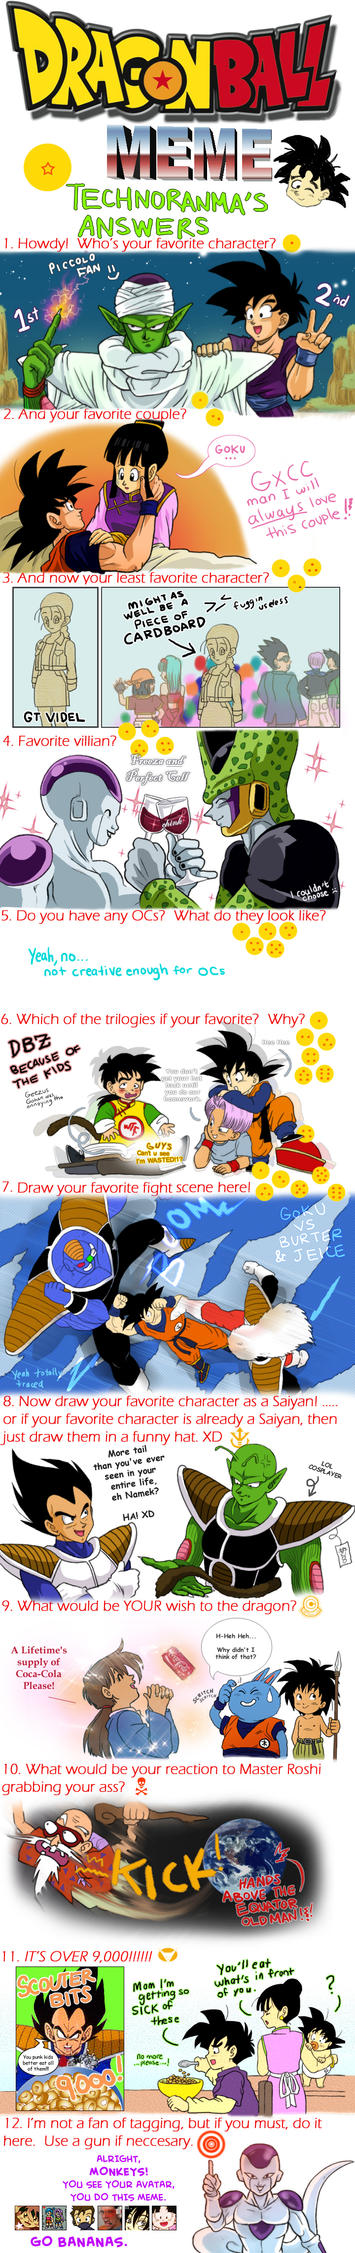 DragonBall Meme by TechnoRanma